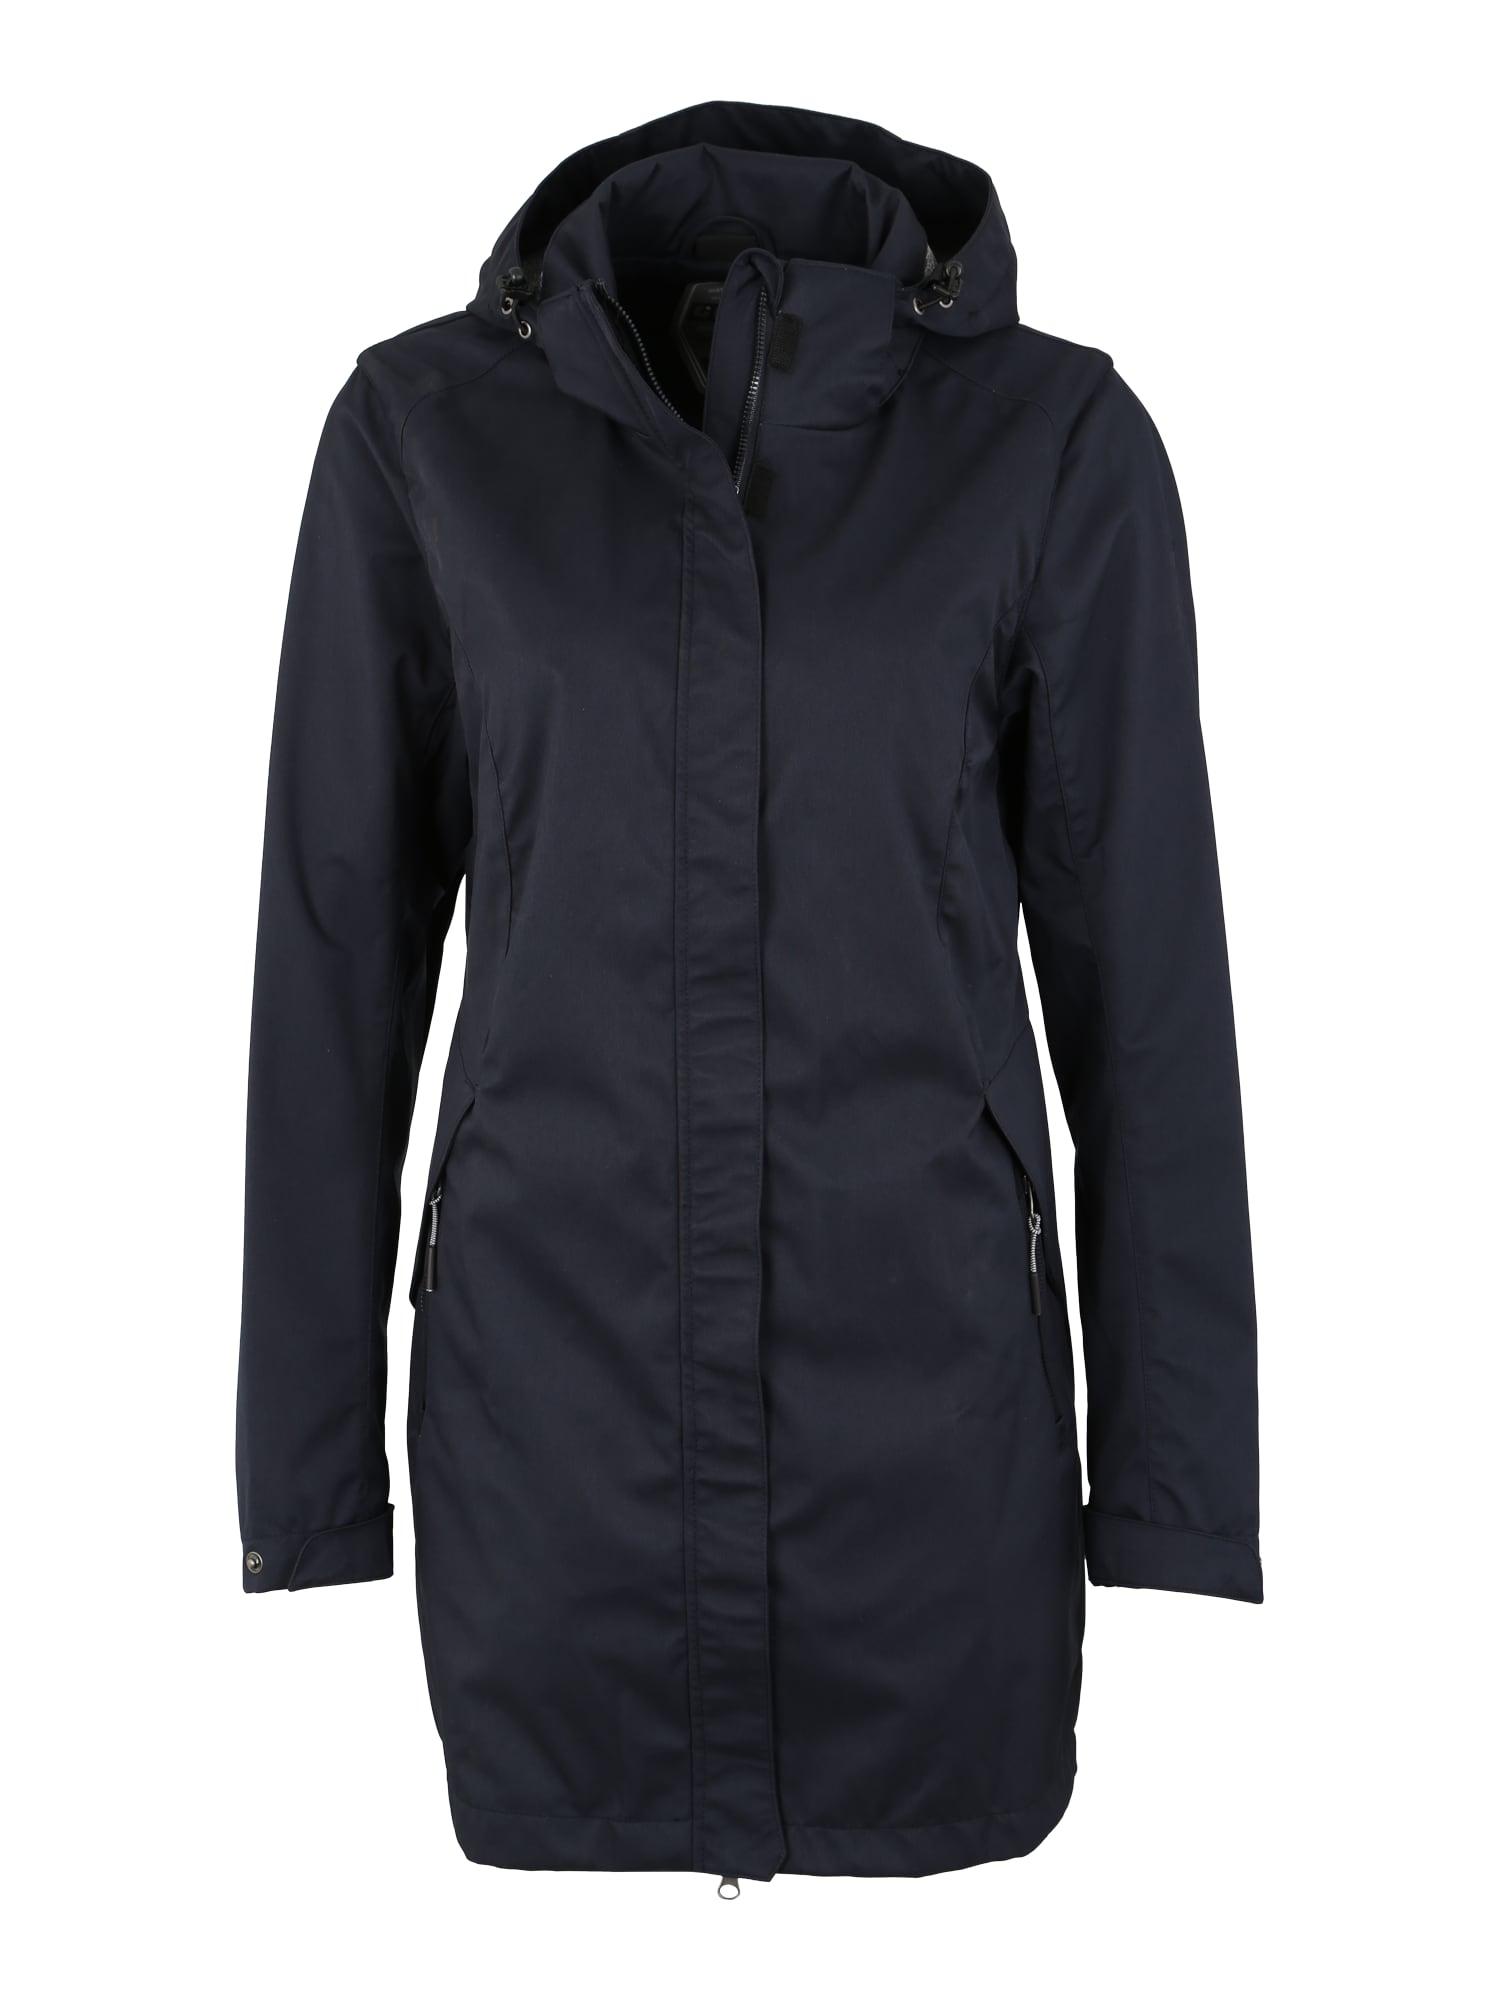 Outdoorový kabát Tylla tmavě modrá KILLTEC